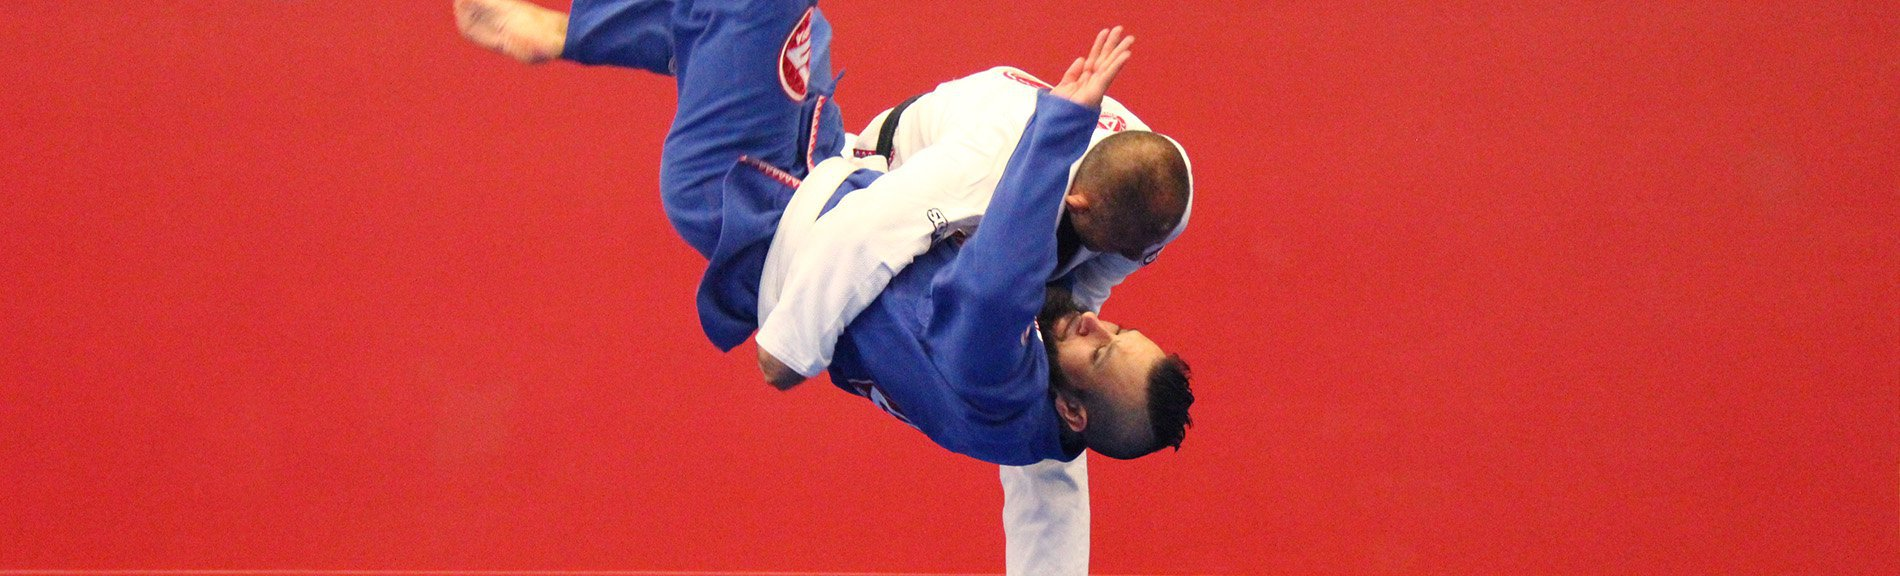 San Diego Brazilian Jiu-Jitsu   Gracie Barra